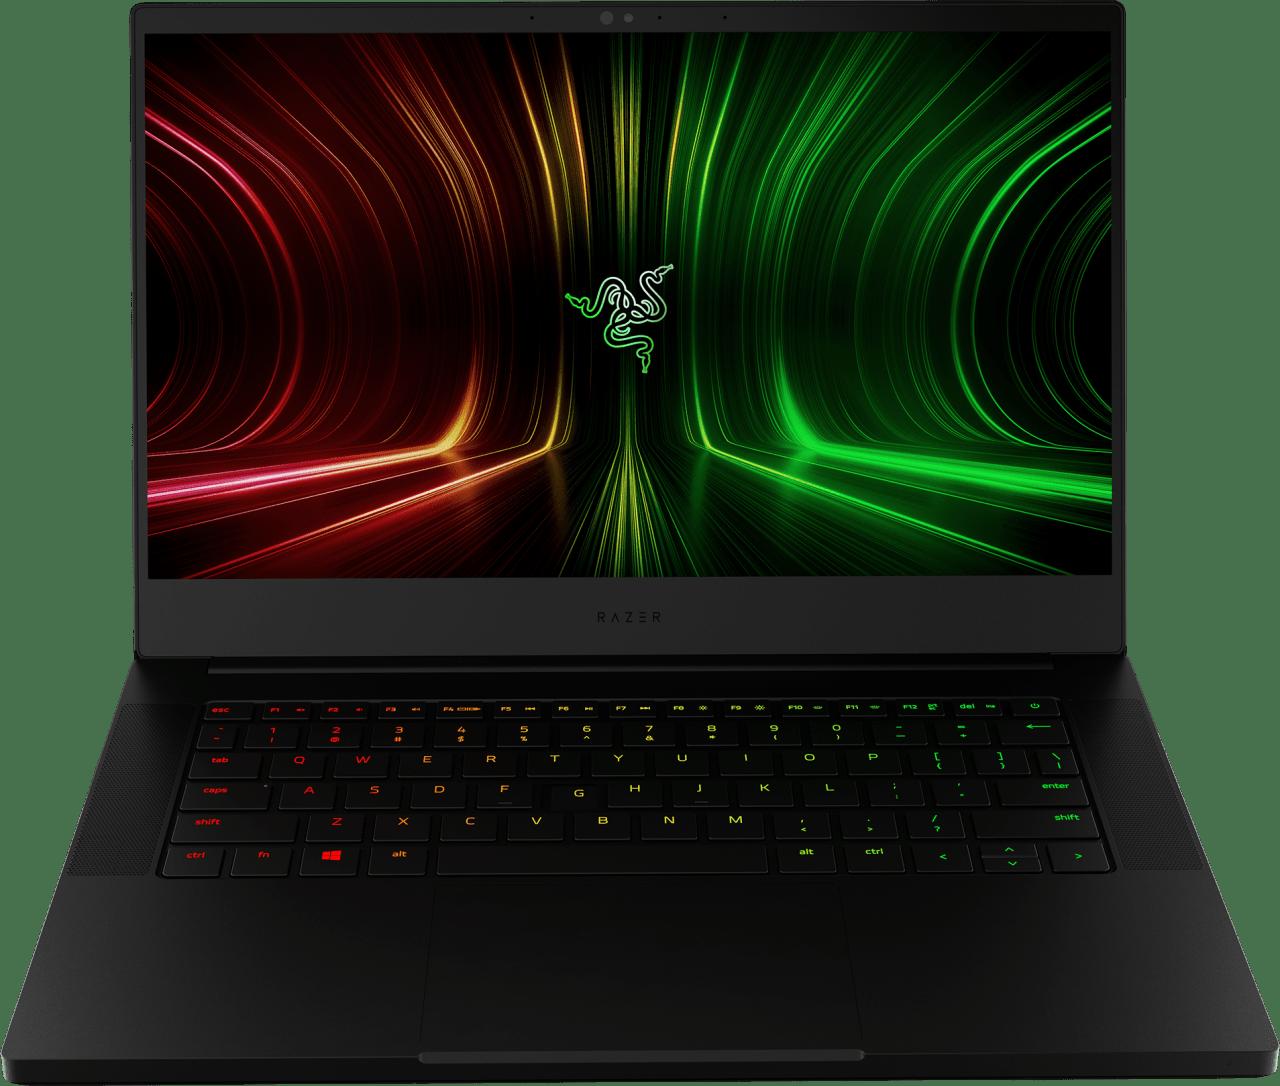 Black Razer Blade 14 (Mid 2021) - Gaming Laptop - AMD Ryzen™ 9 5900HX - 16GB - 1TB SSD - NVIDIA® GeForce® RTX 3070 (8GB).1